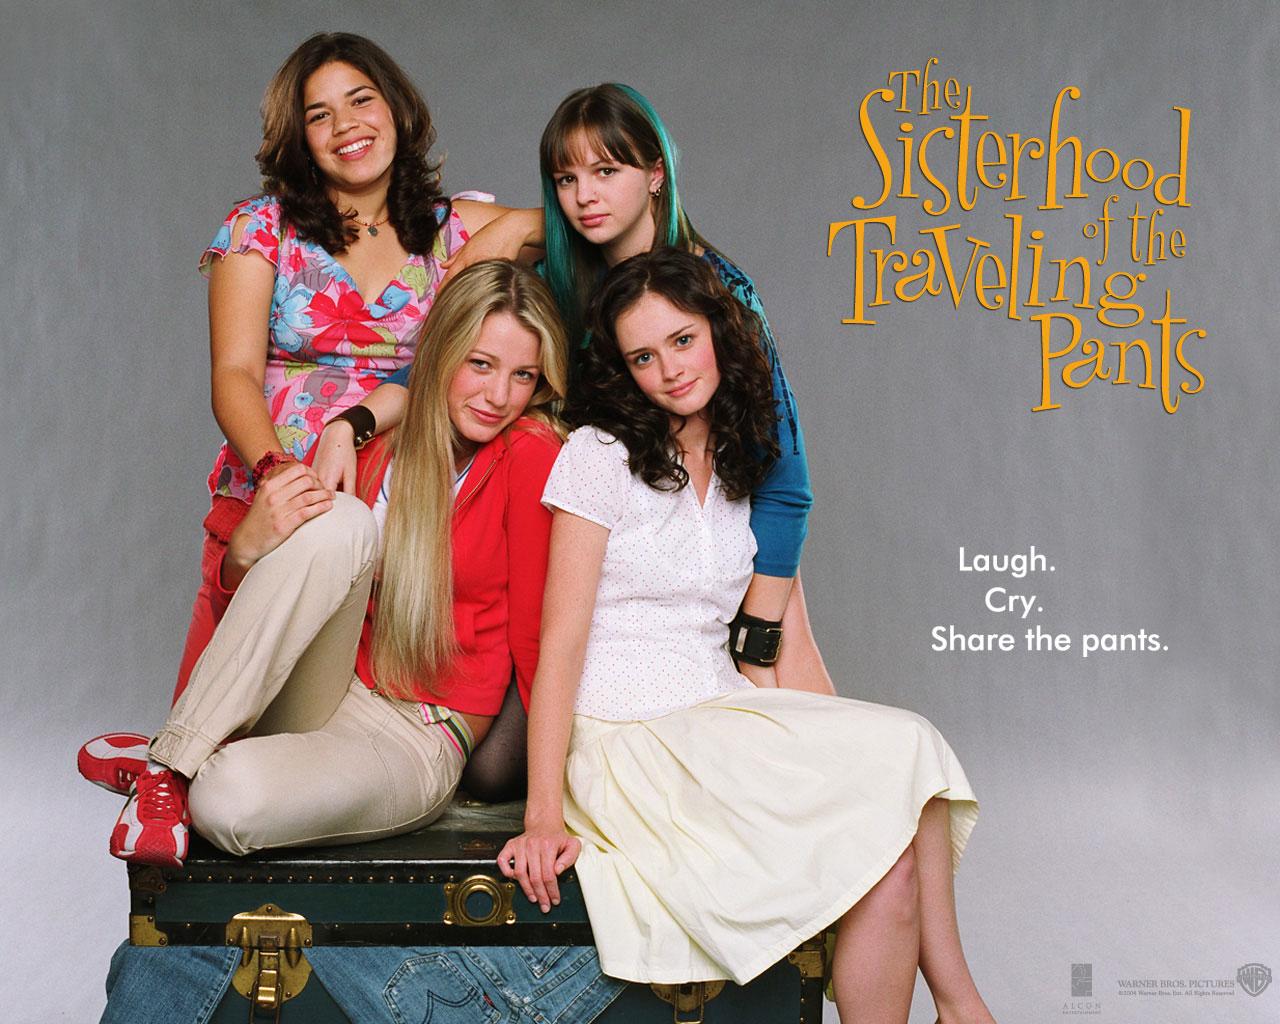 http://3.bp.blogspot.com/_afoaRWnUSQw/TOoyOLLSo4I/AAAAAAAAAqg/JN5d_bvQHho/s1600/2005_the_sisterhood_of_the_traveling_pants_wallpaper_006.jpg